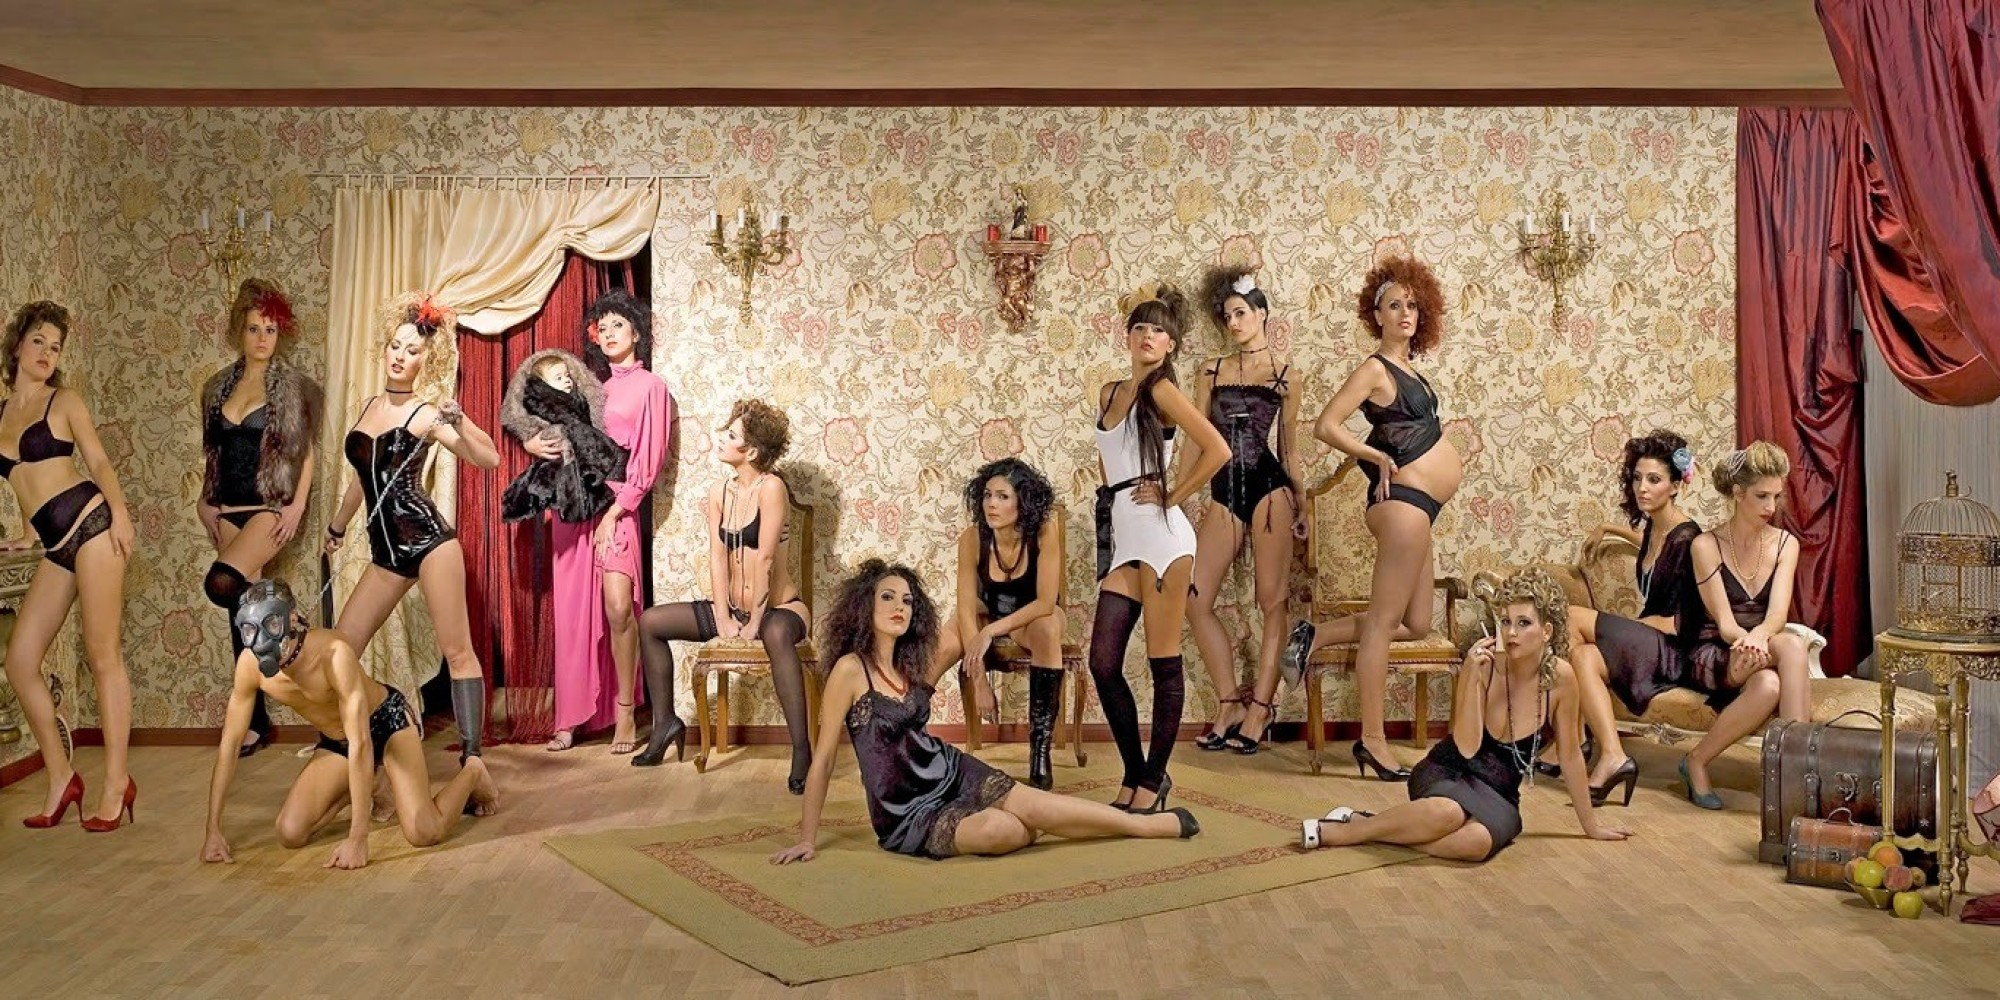 ver online la gloria de las prostitutas prostitutas en europa